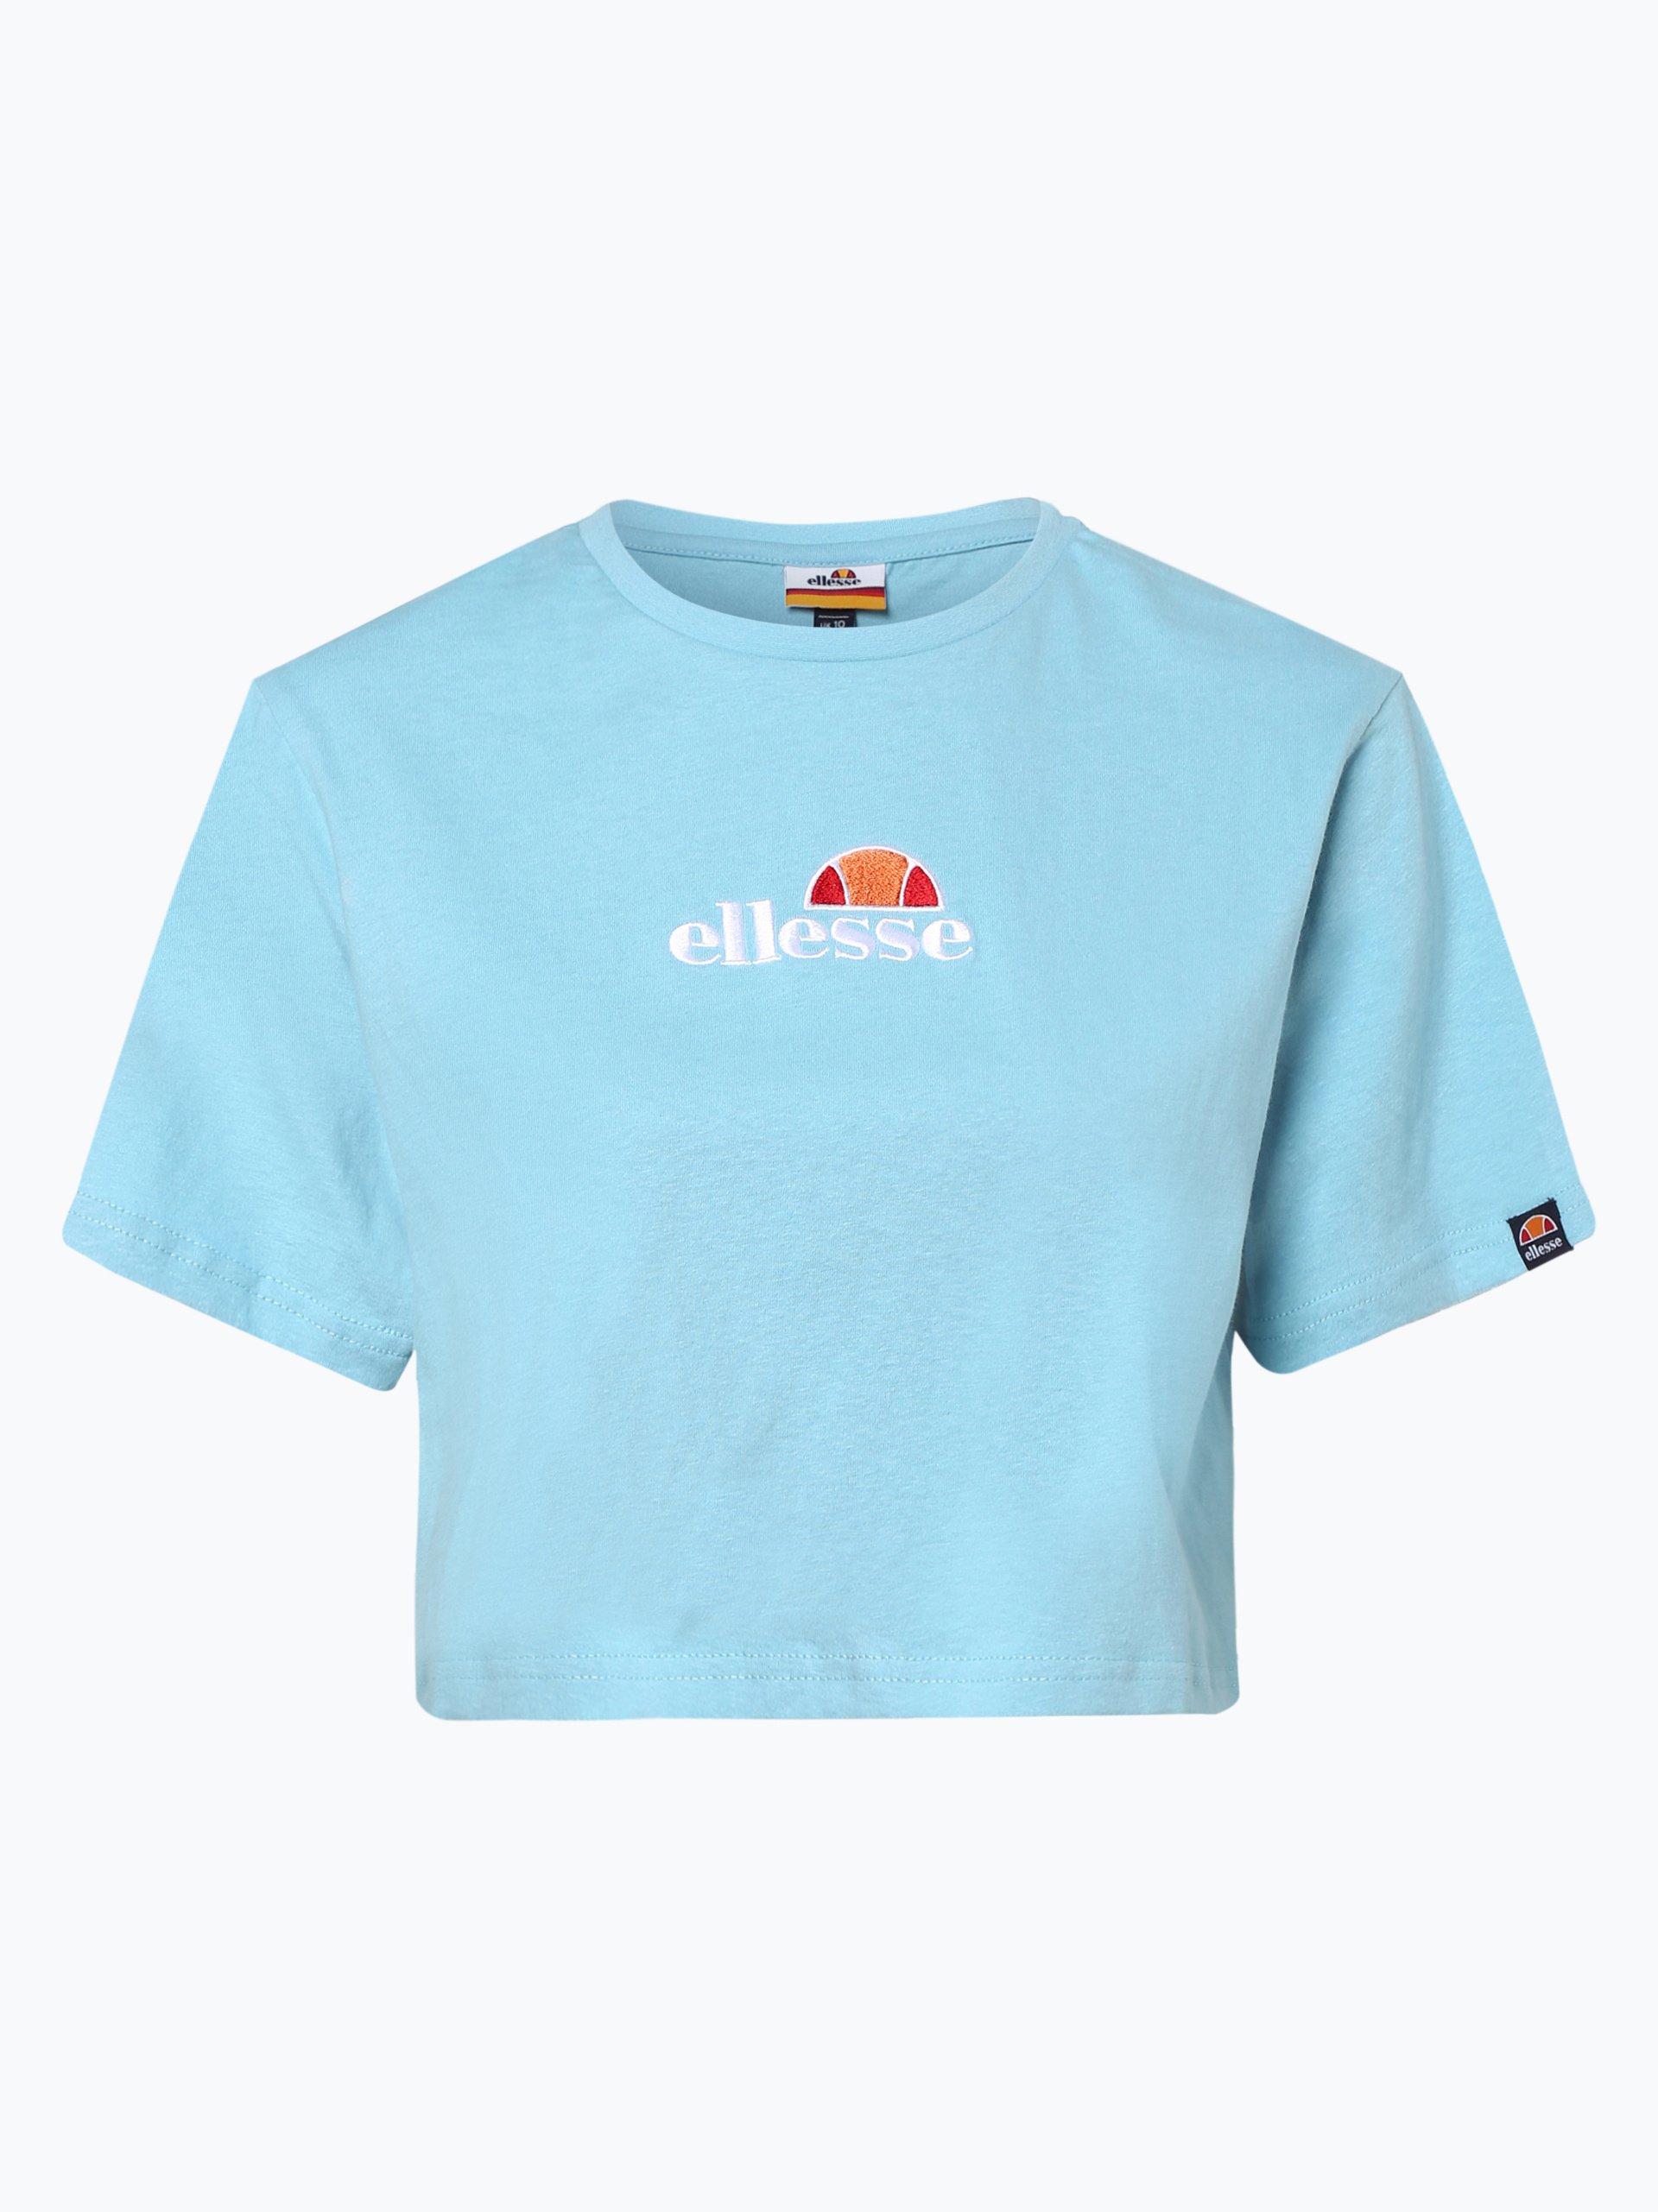 ellesse T-shirt damski – Fireball